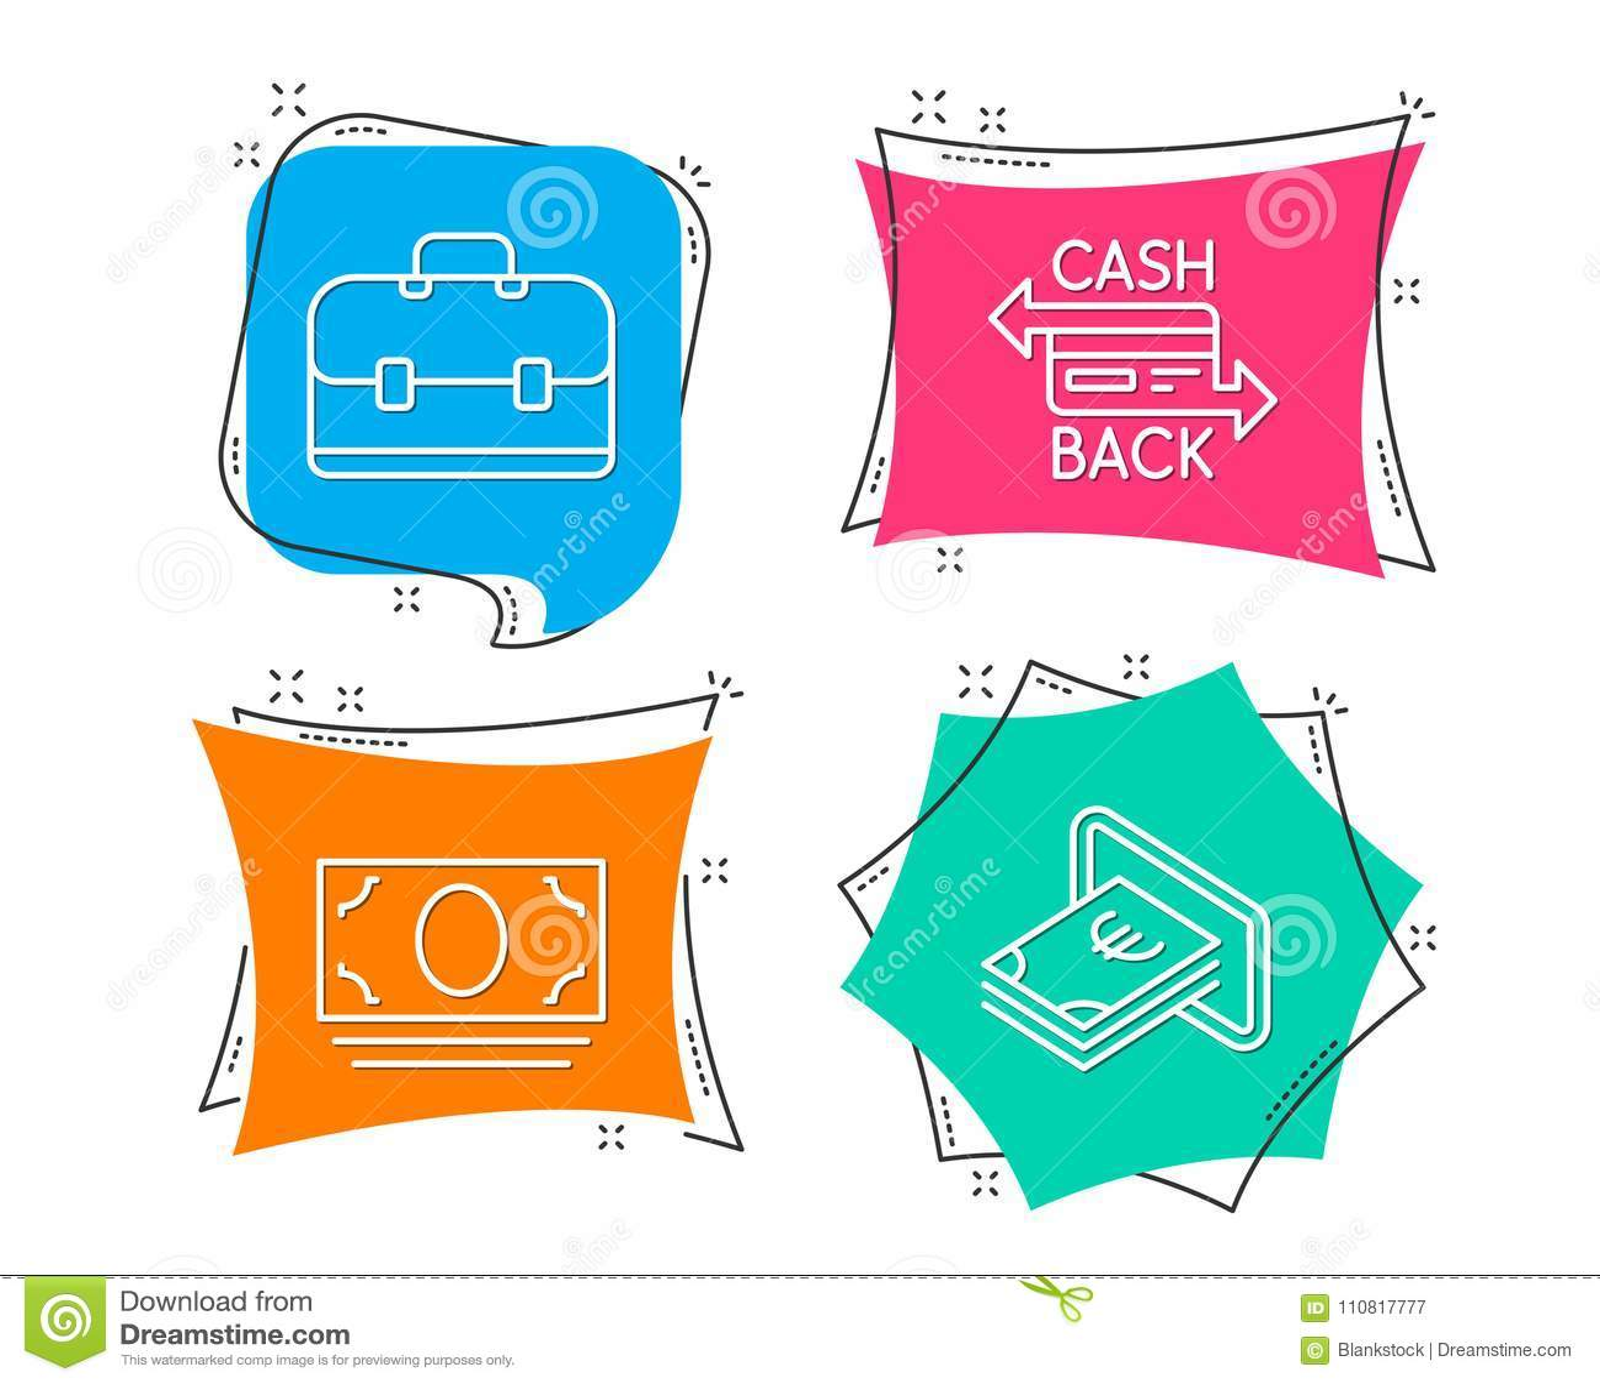 Cash money portfolio and cashback card icons cash sign banking cash money portfolio and cashback card icons cash sign banking currency business colourmoves